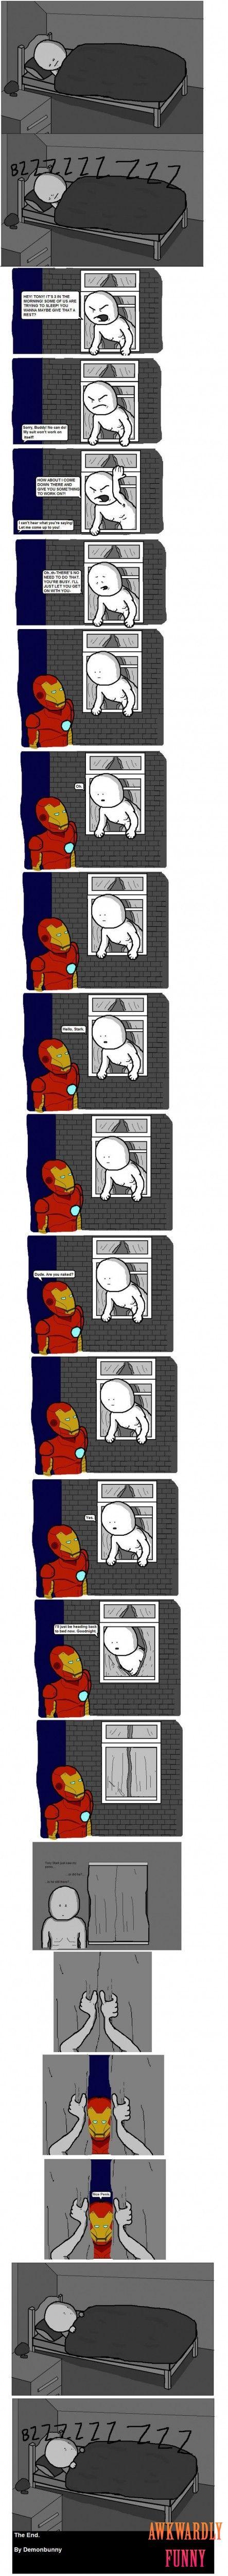 ROFL!!! Living next to Iron Man